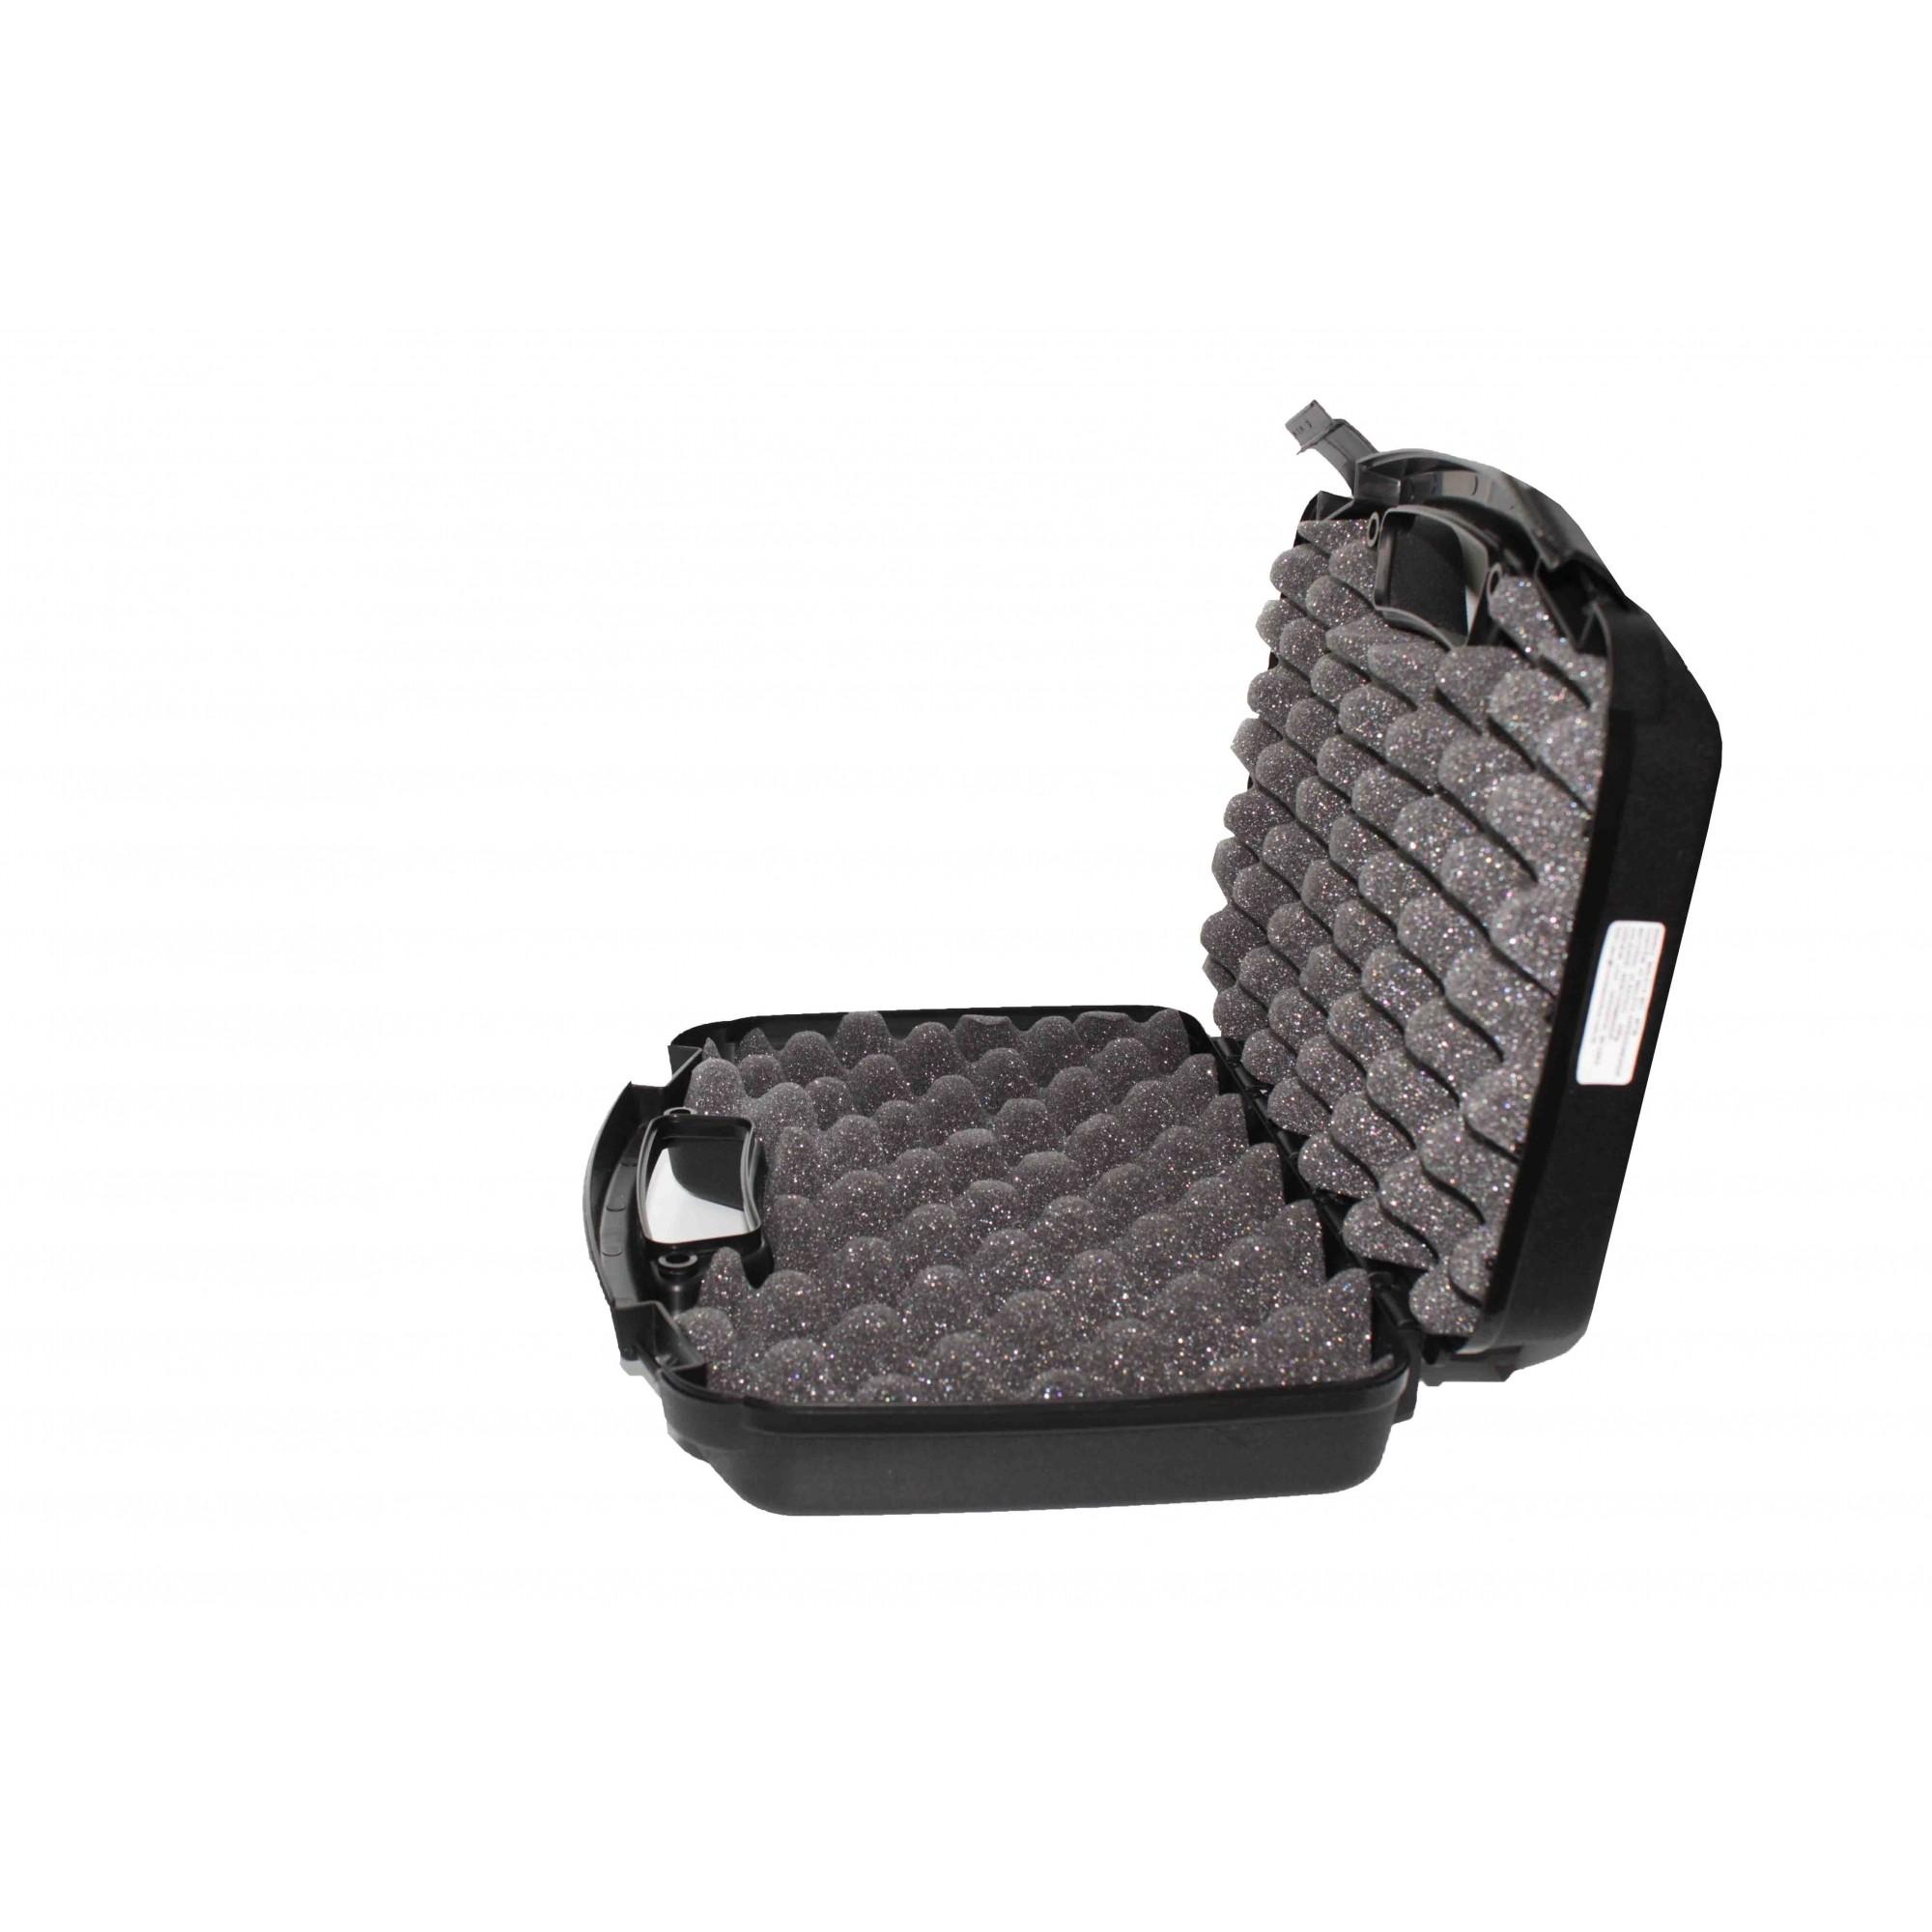 Maleta Case Rigida Para Armas 807